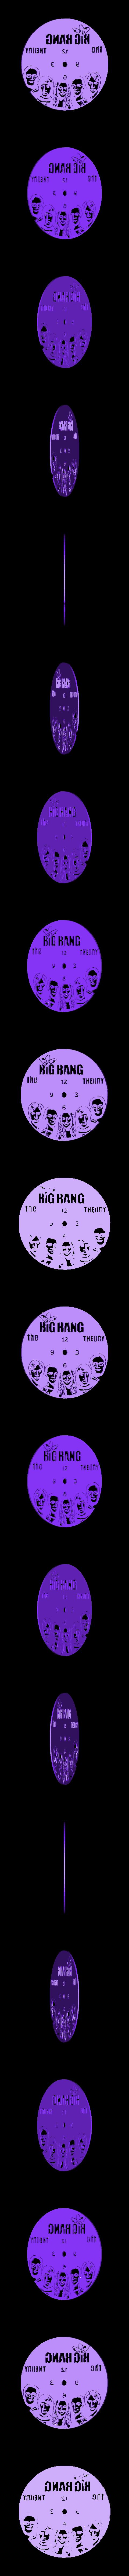 BigBangTeory.stl Download STL file Clock vinyl collection • 3D printer design, razoner